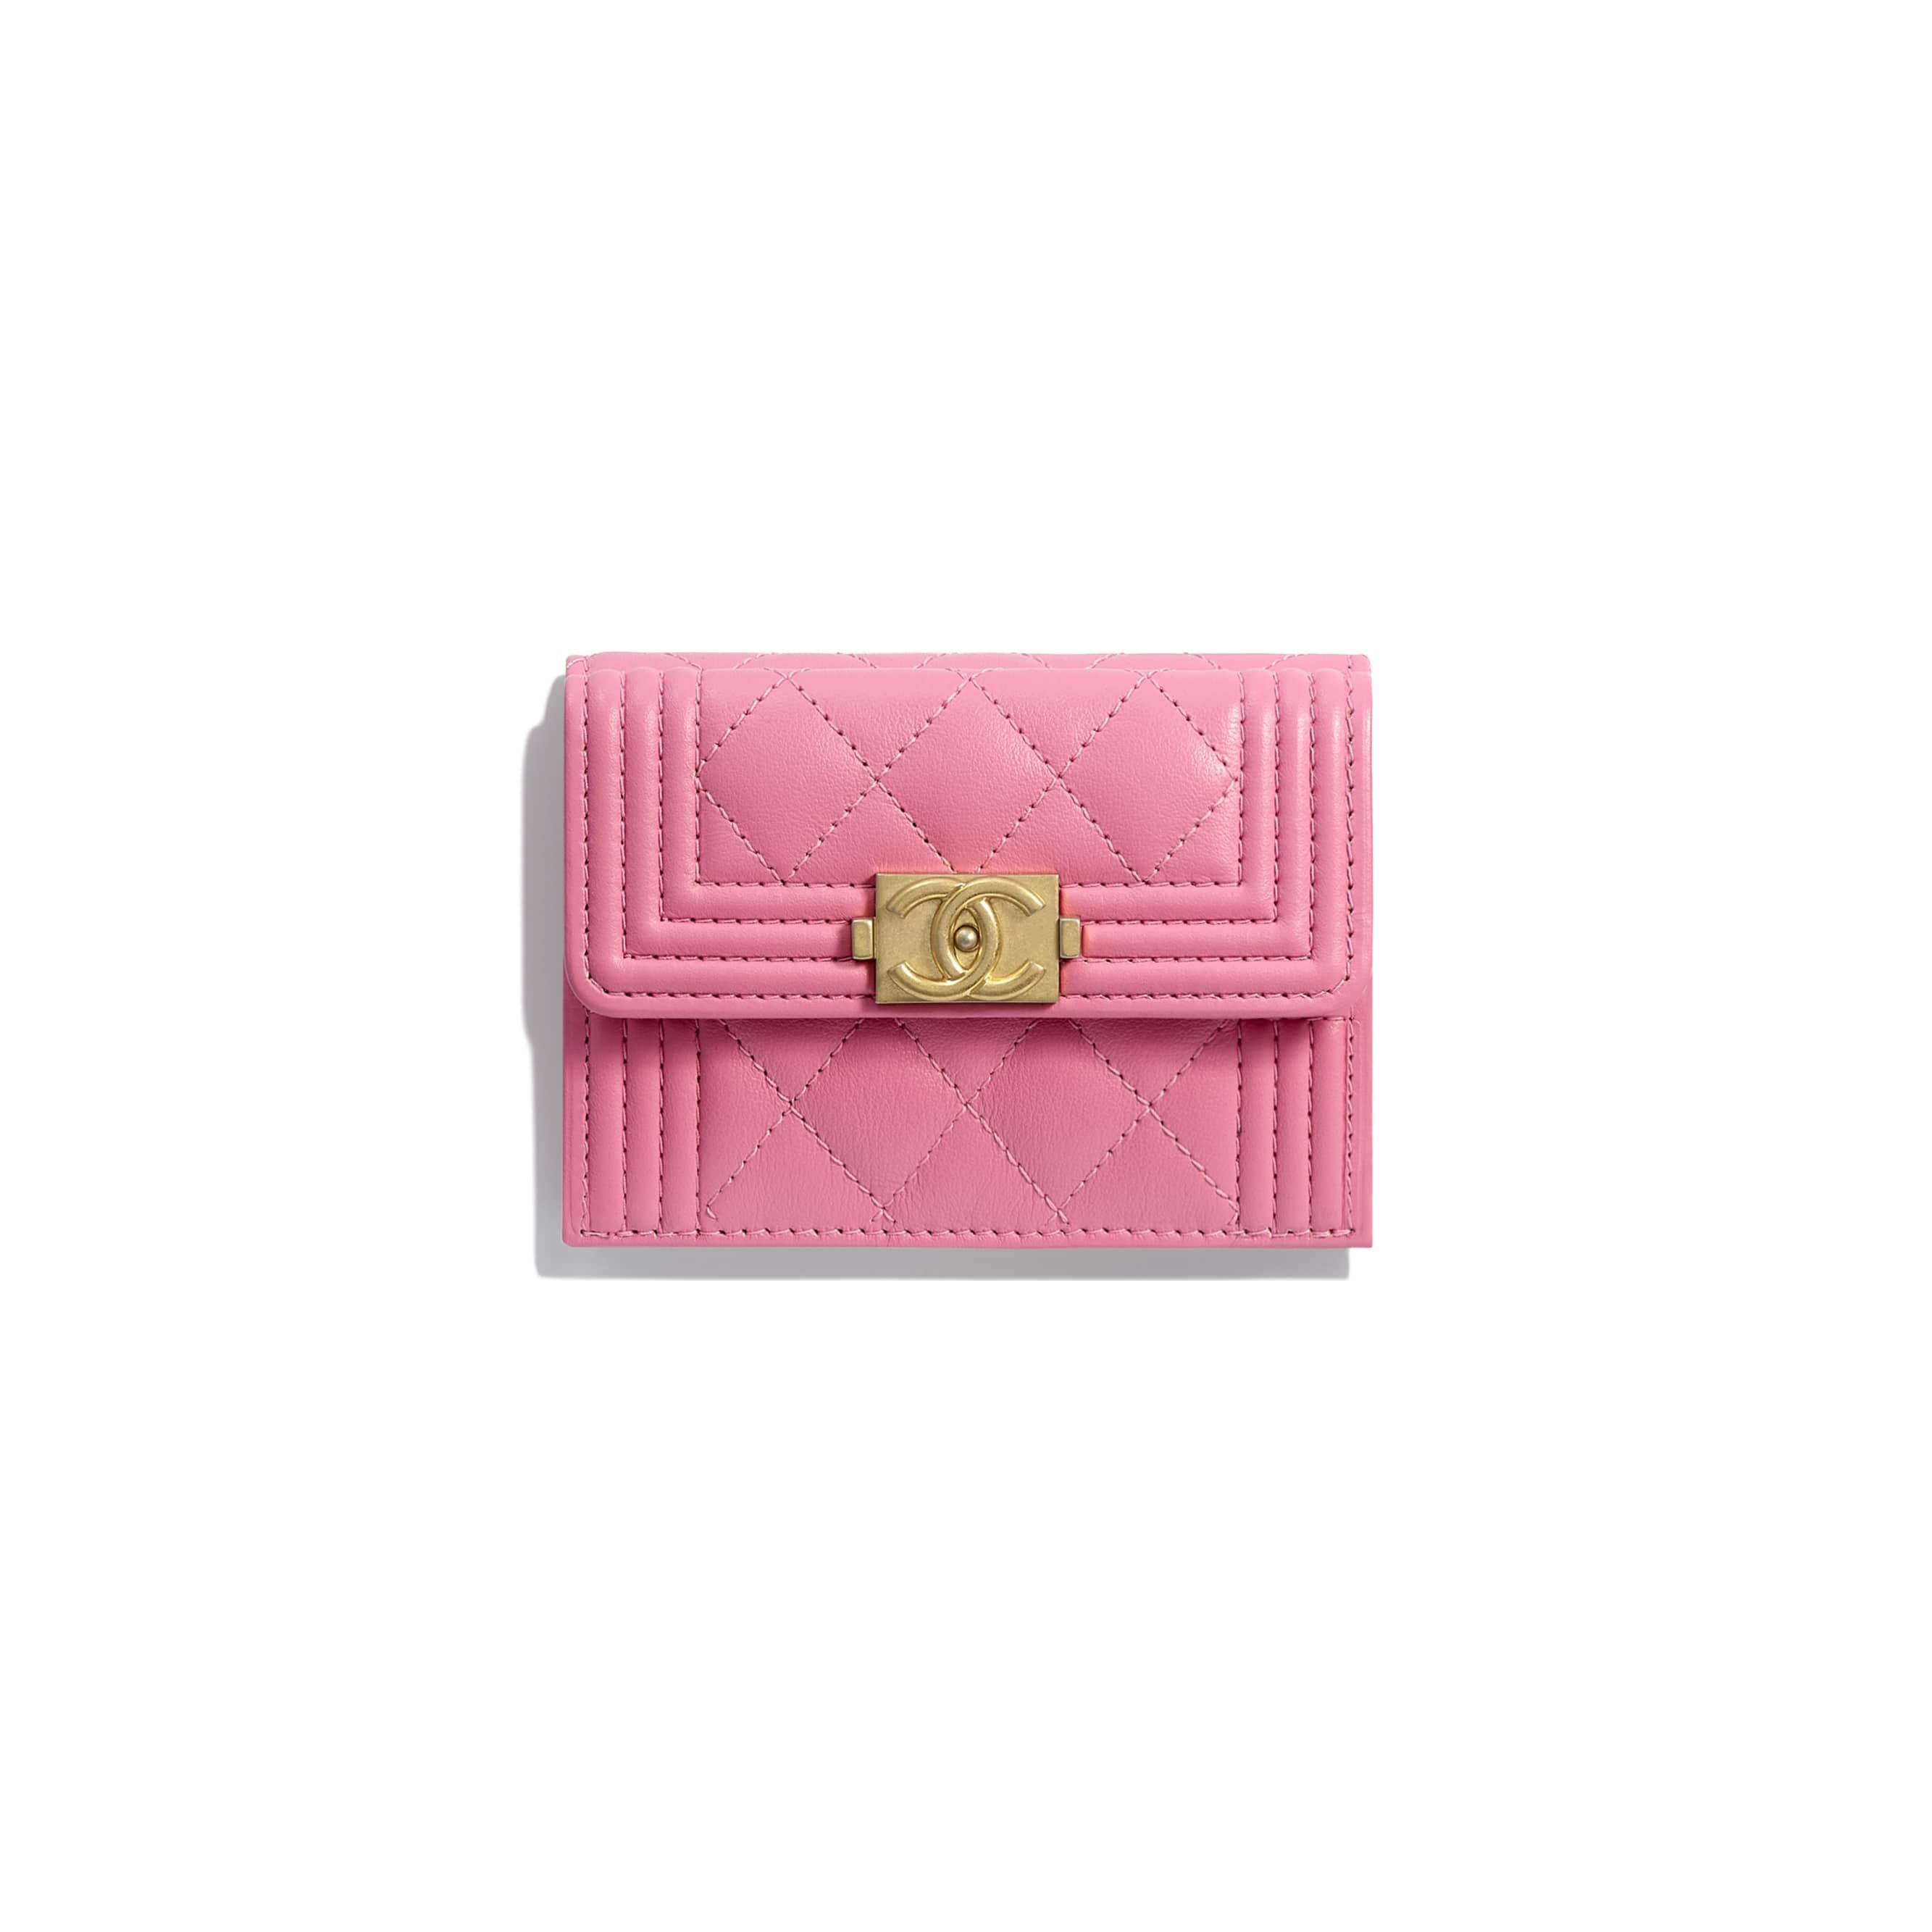 58ba23e0b6336 BOY CHANEL Small Flap Wallet - Pink - Calfskin   Gold-Tone Metal - Default  view - see standard sized version